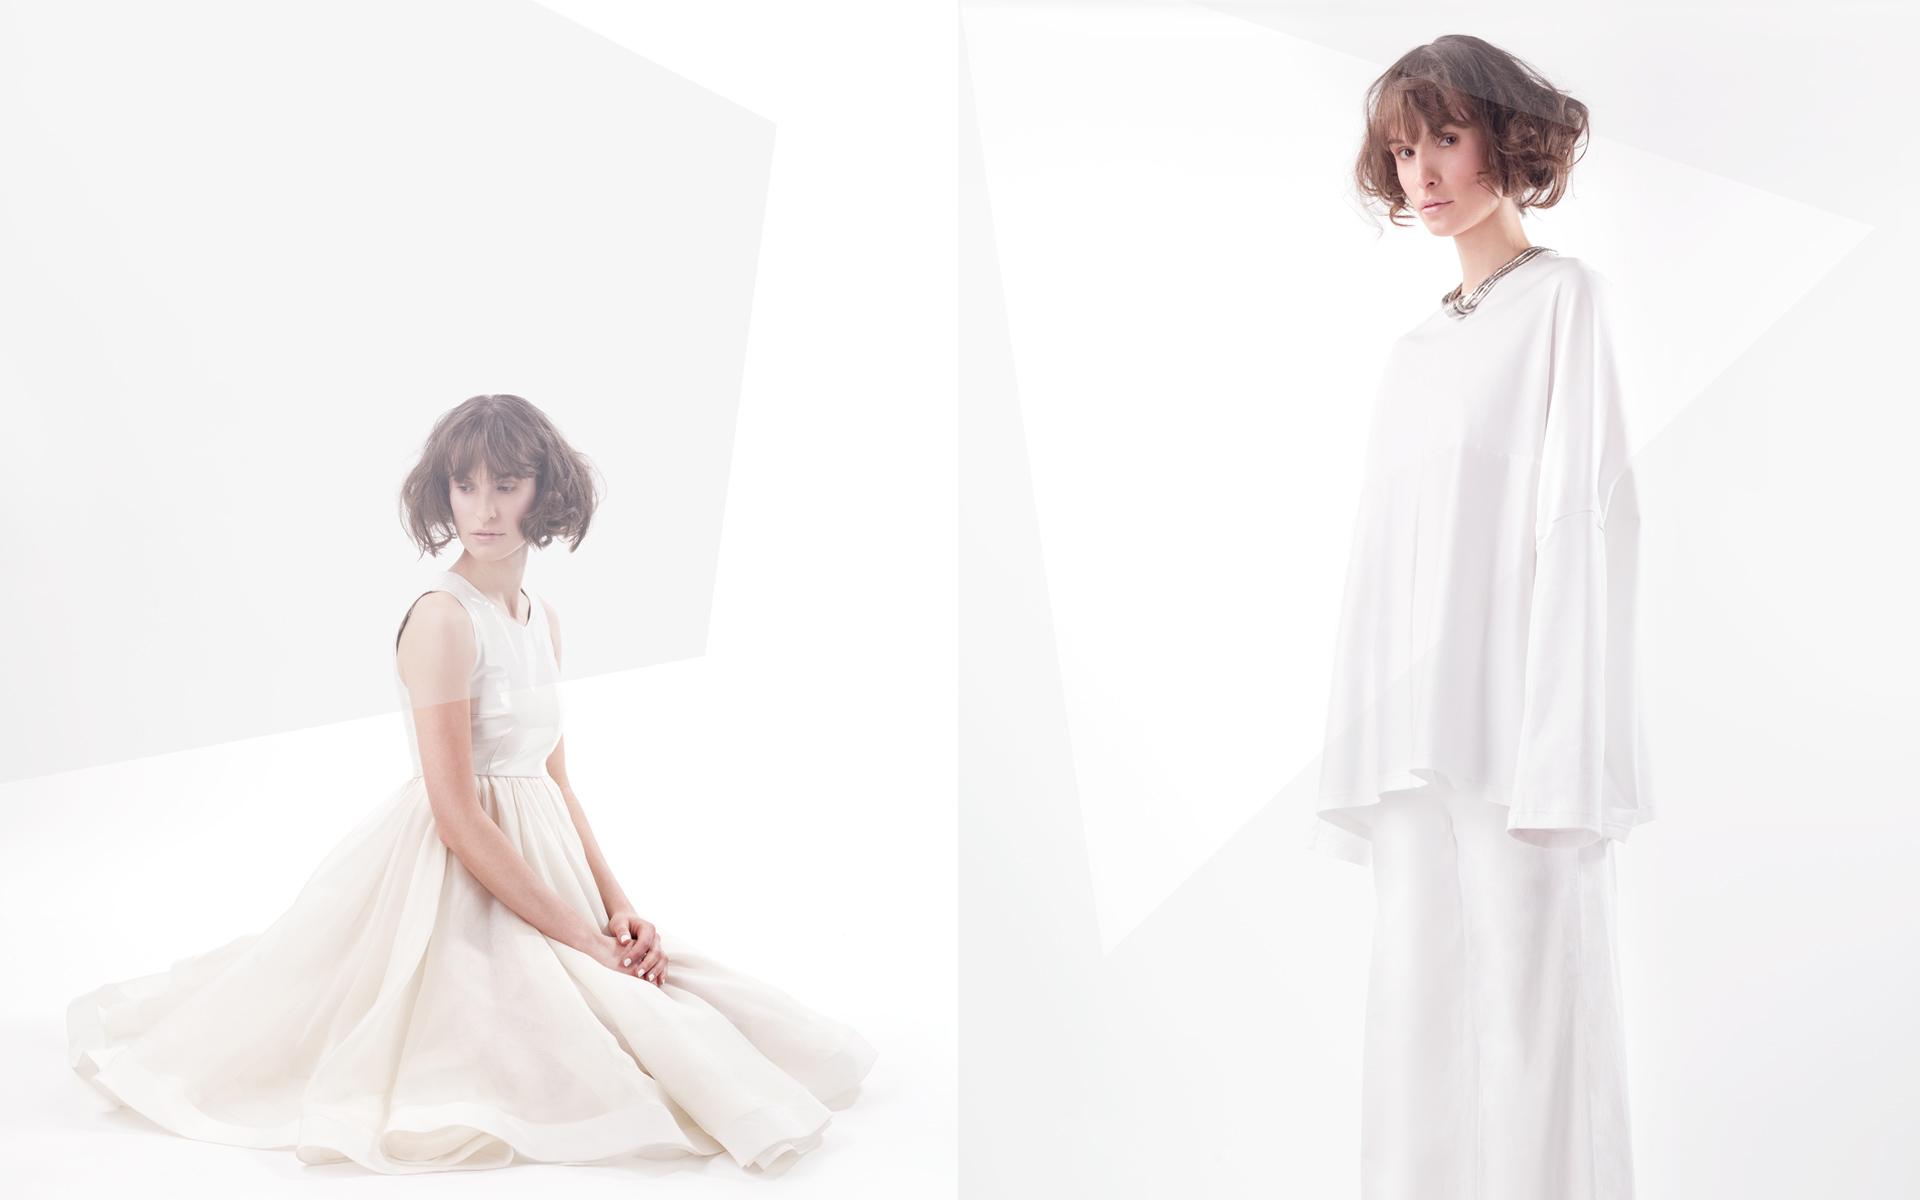 085_Fashion_F.Roncaldier